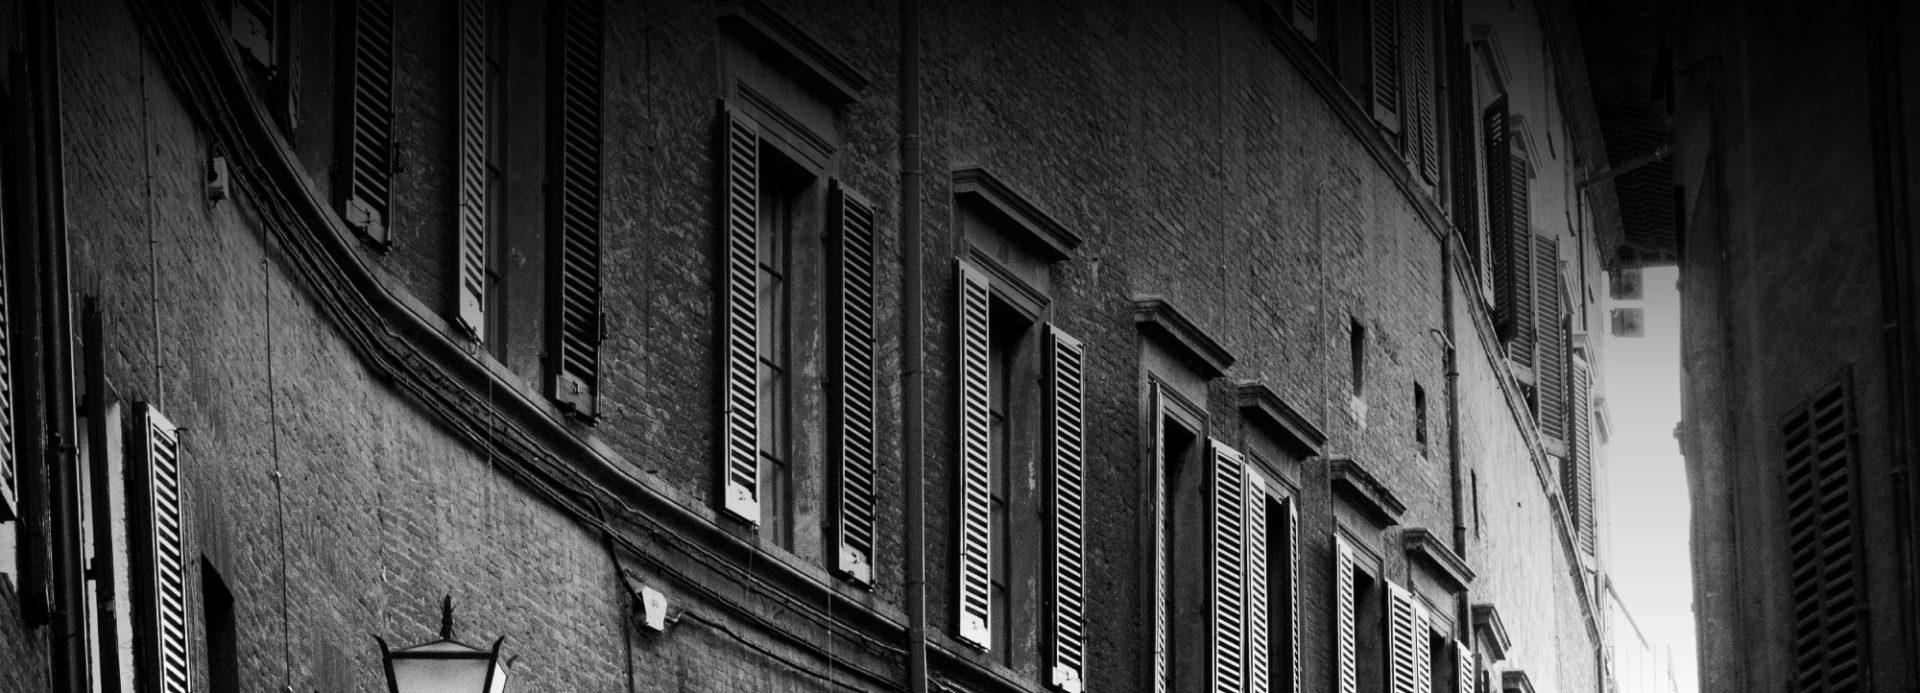 Aperto_home banner 02